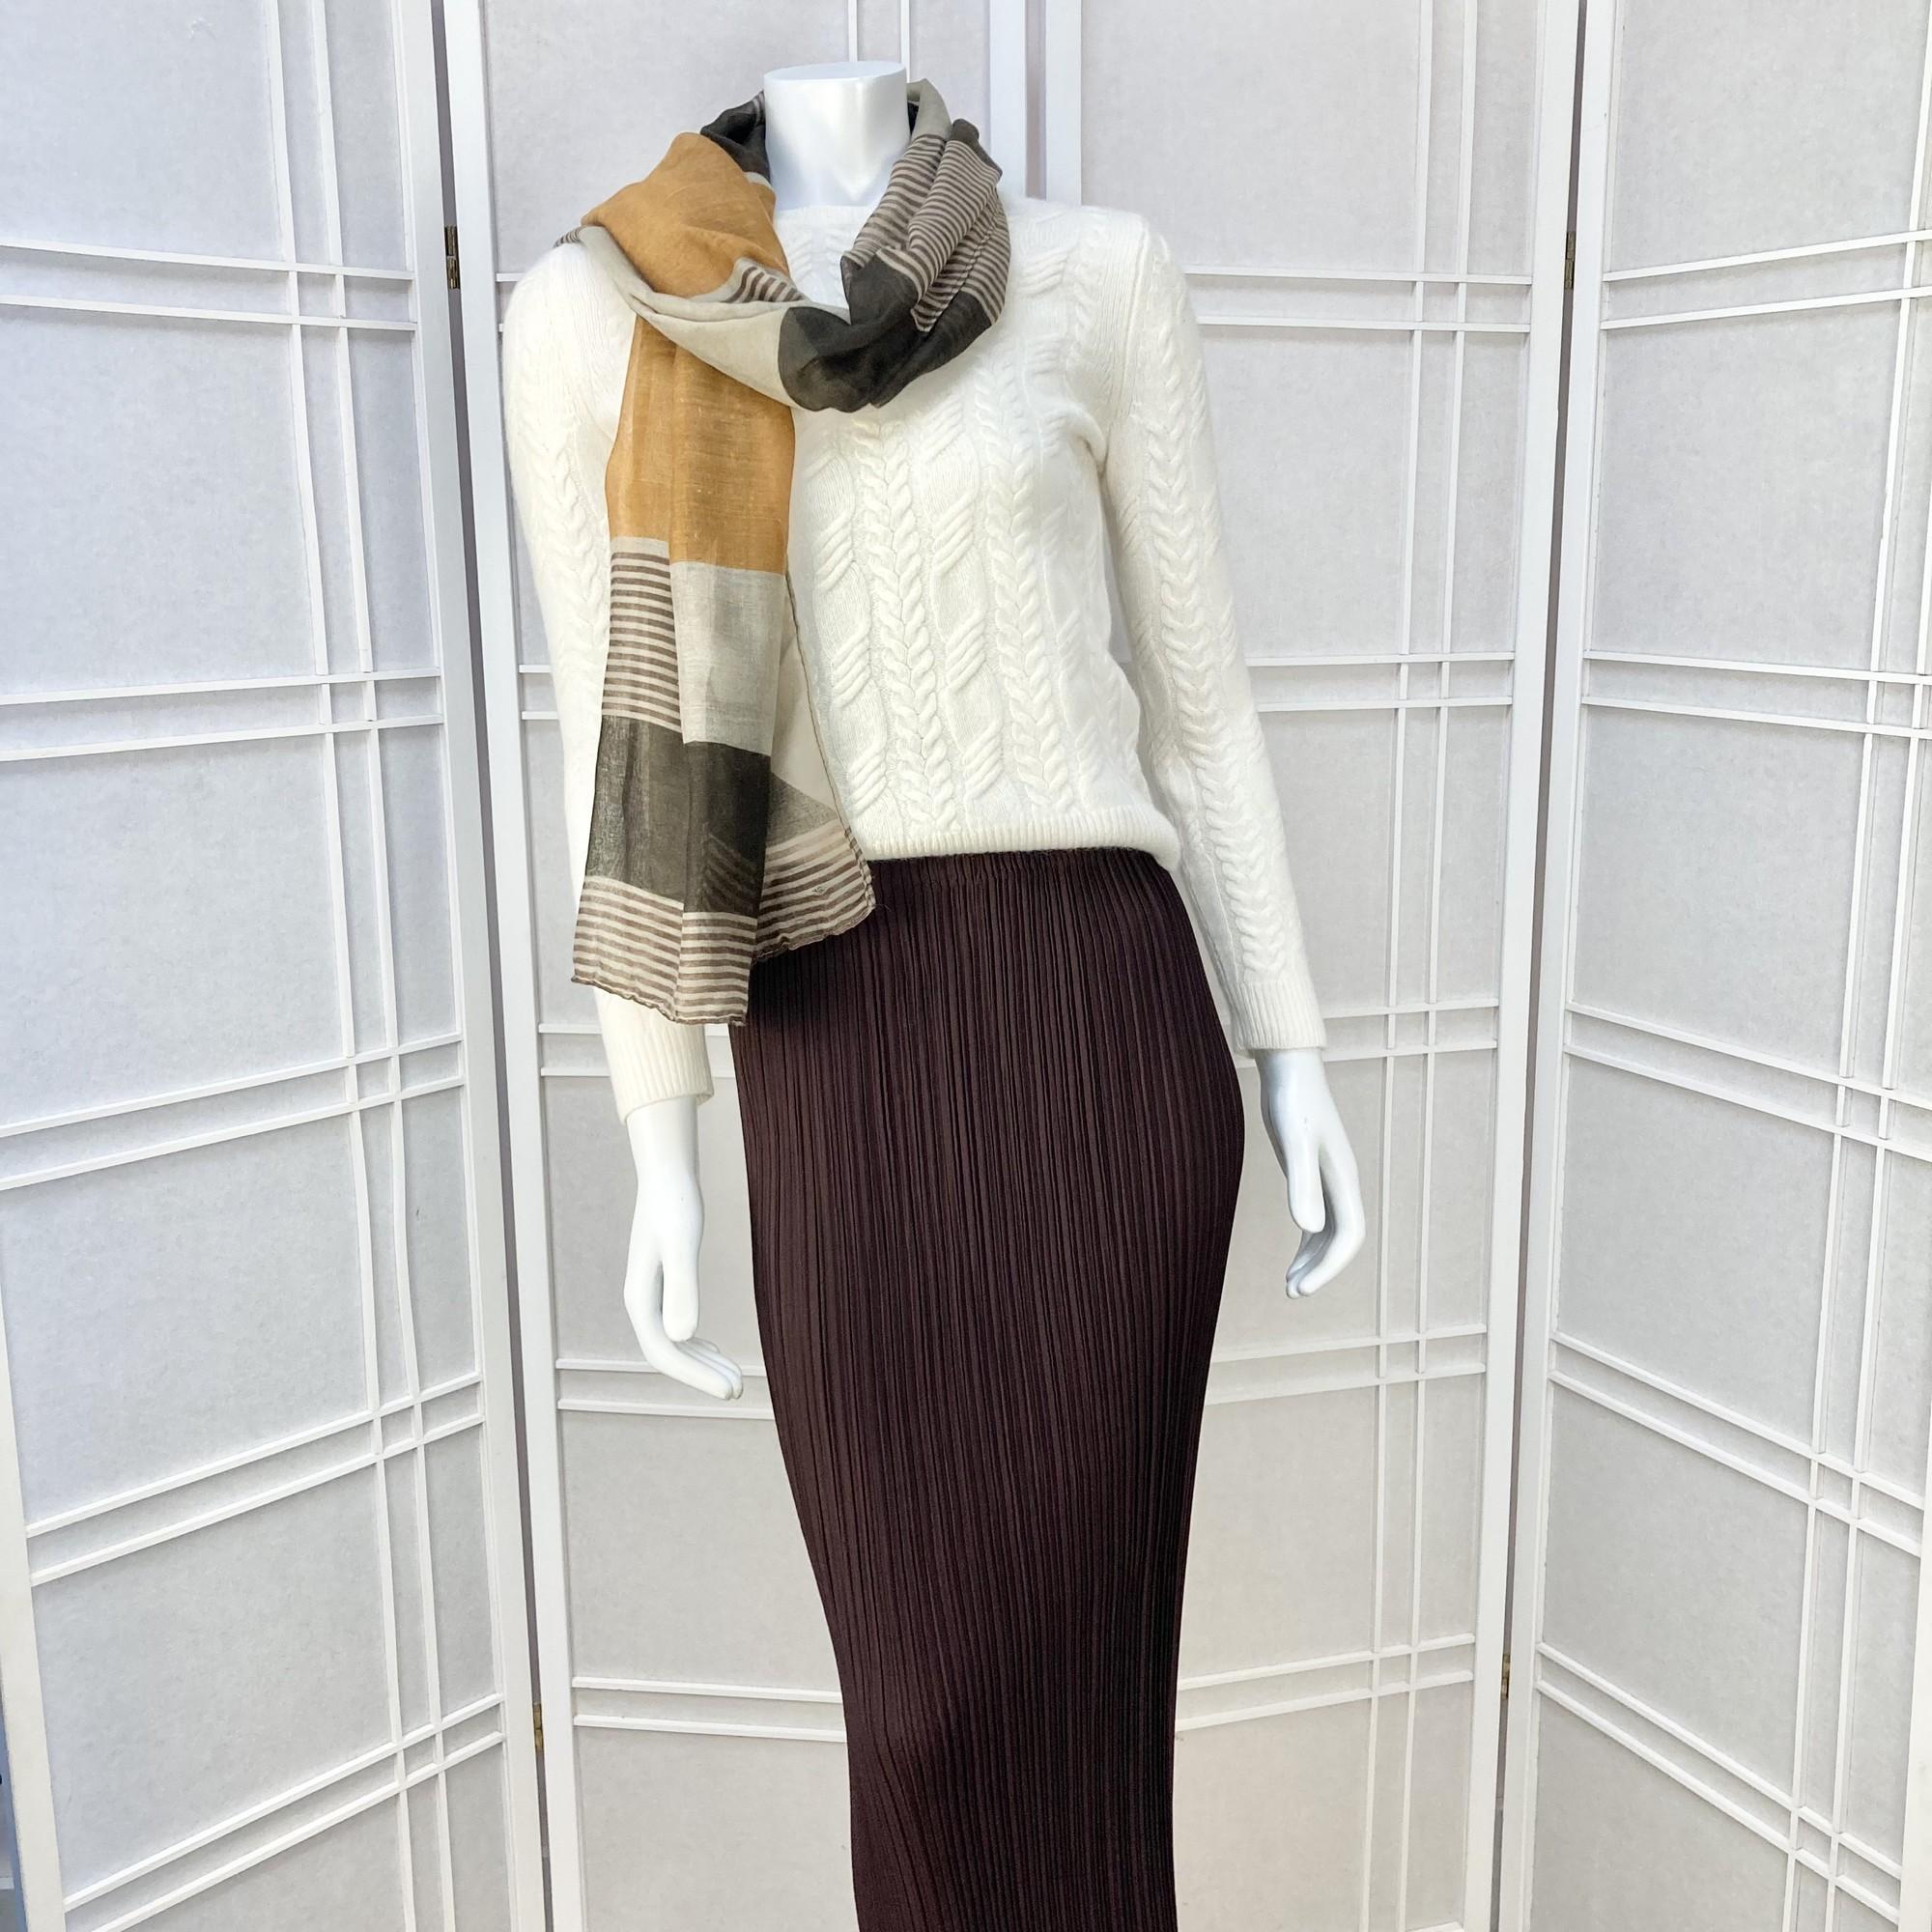 Lezley George London Skirt, Brown, Size: S